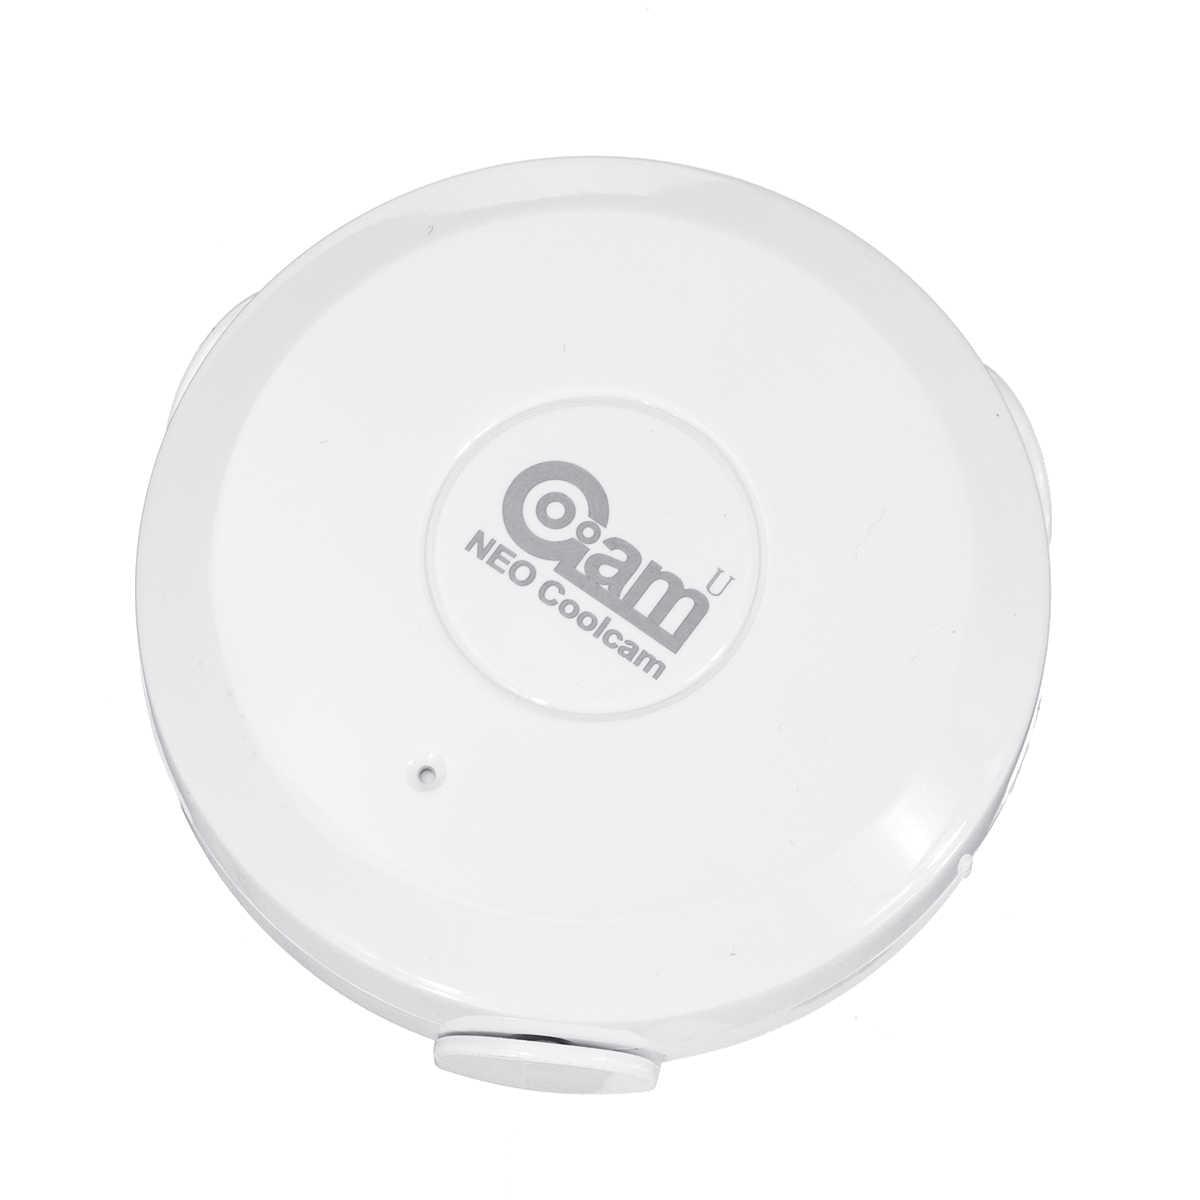 Leakage Sensor Smart Z-Wave Flood Water Leak Alarm Probe Overflow Sensor Home Automation System US Version Detector Tools